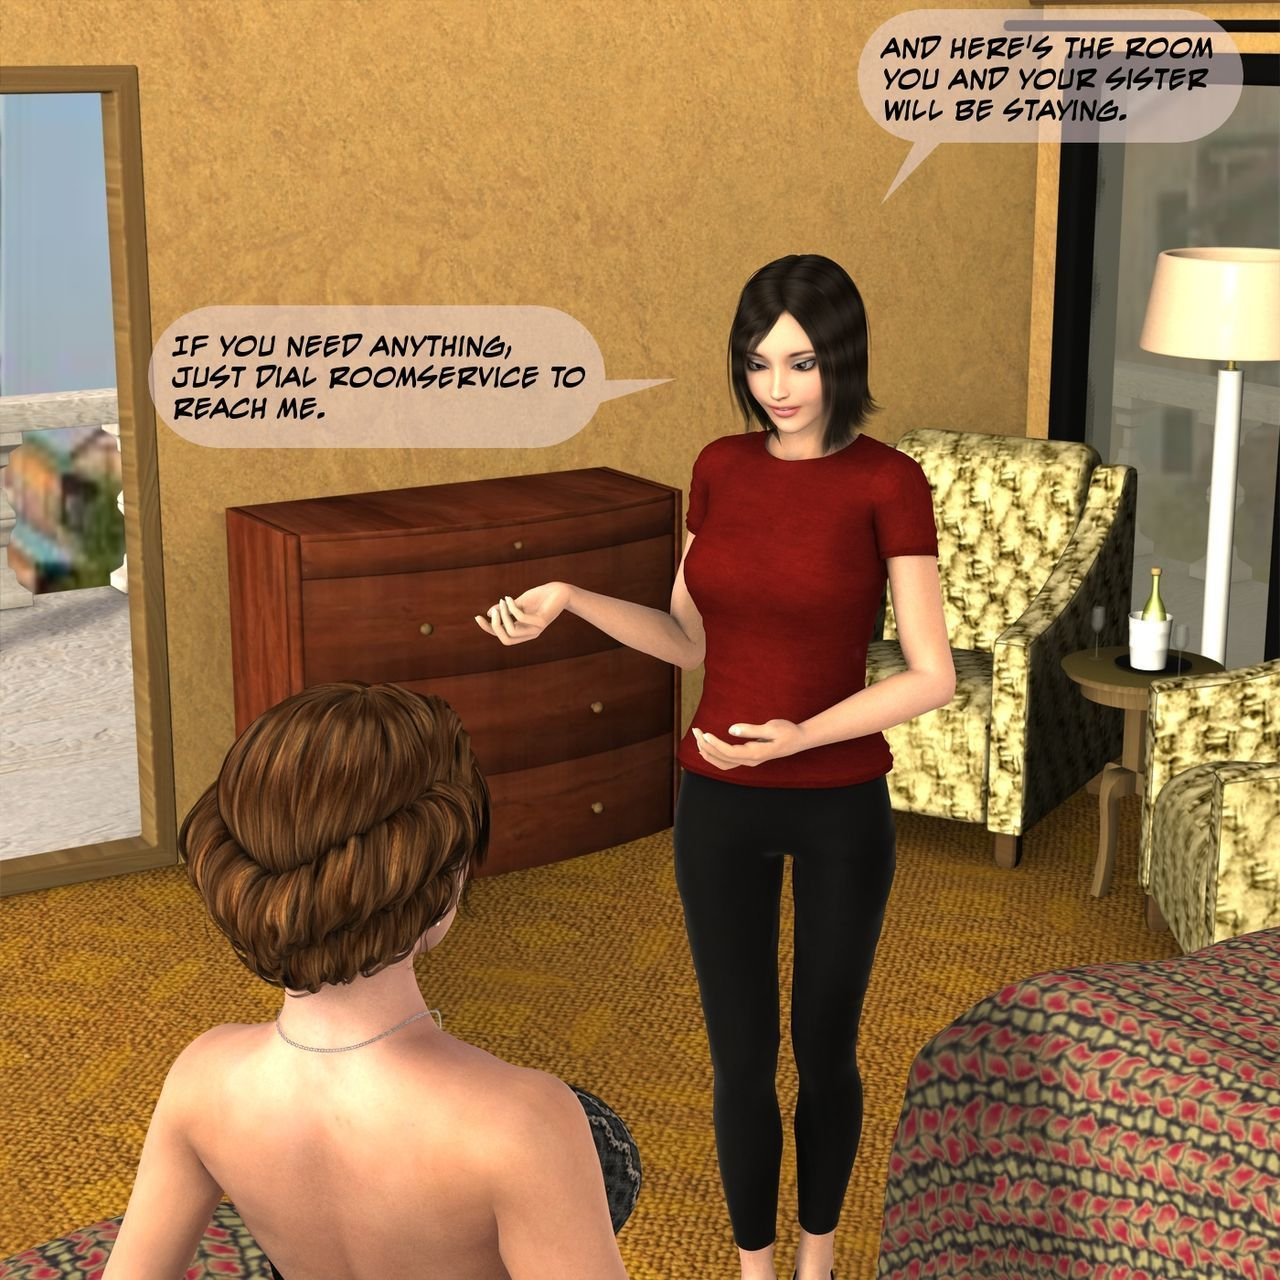 [Fasdeviant] Ashbury Private Health Resort - Chapter 3 - part 3